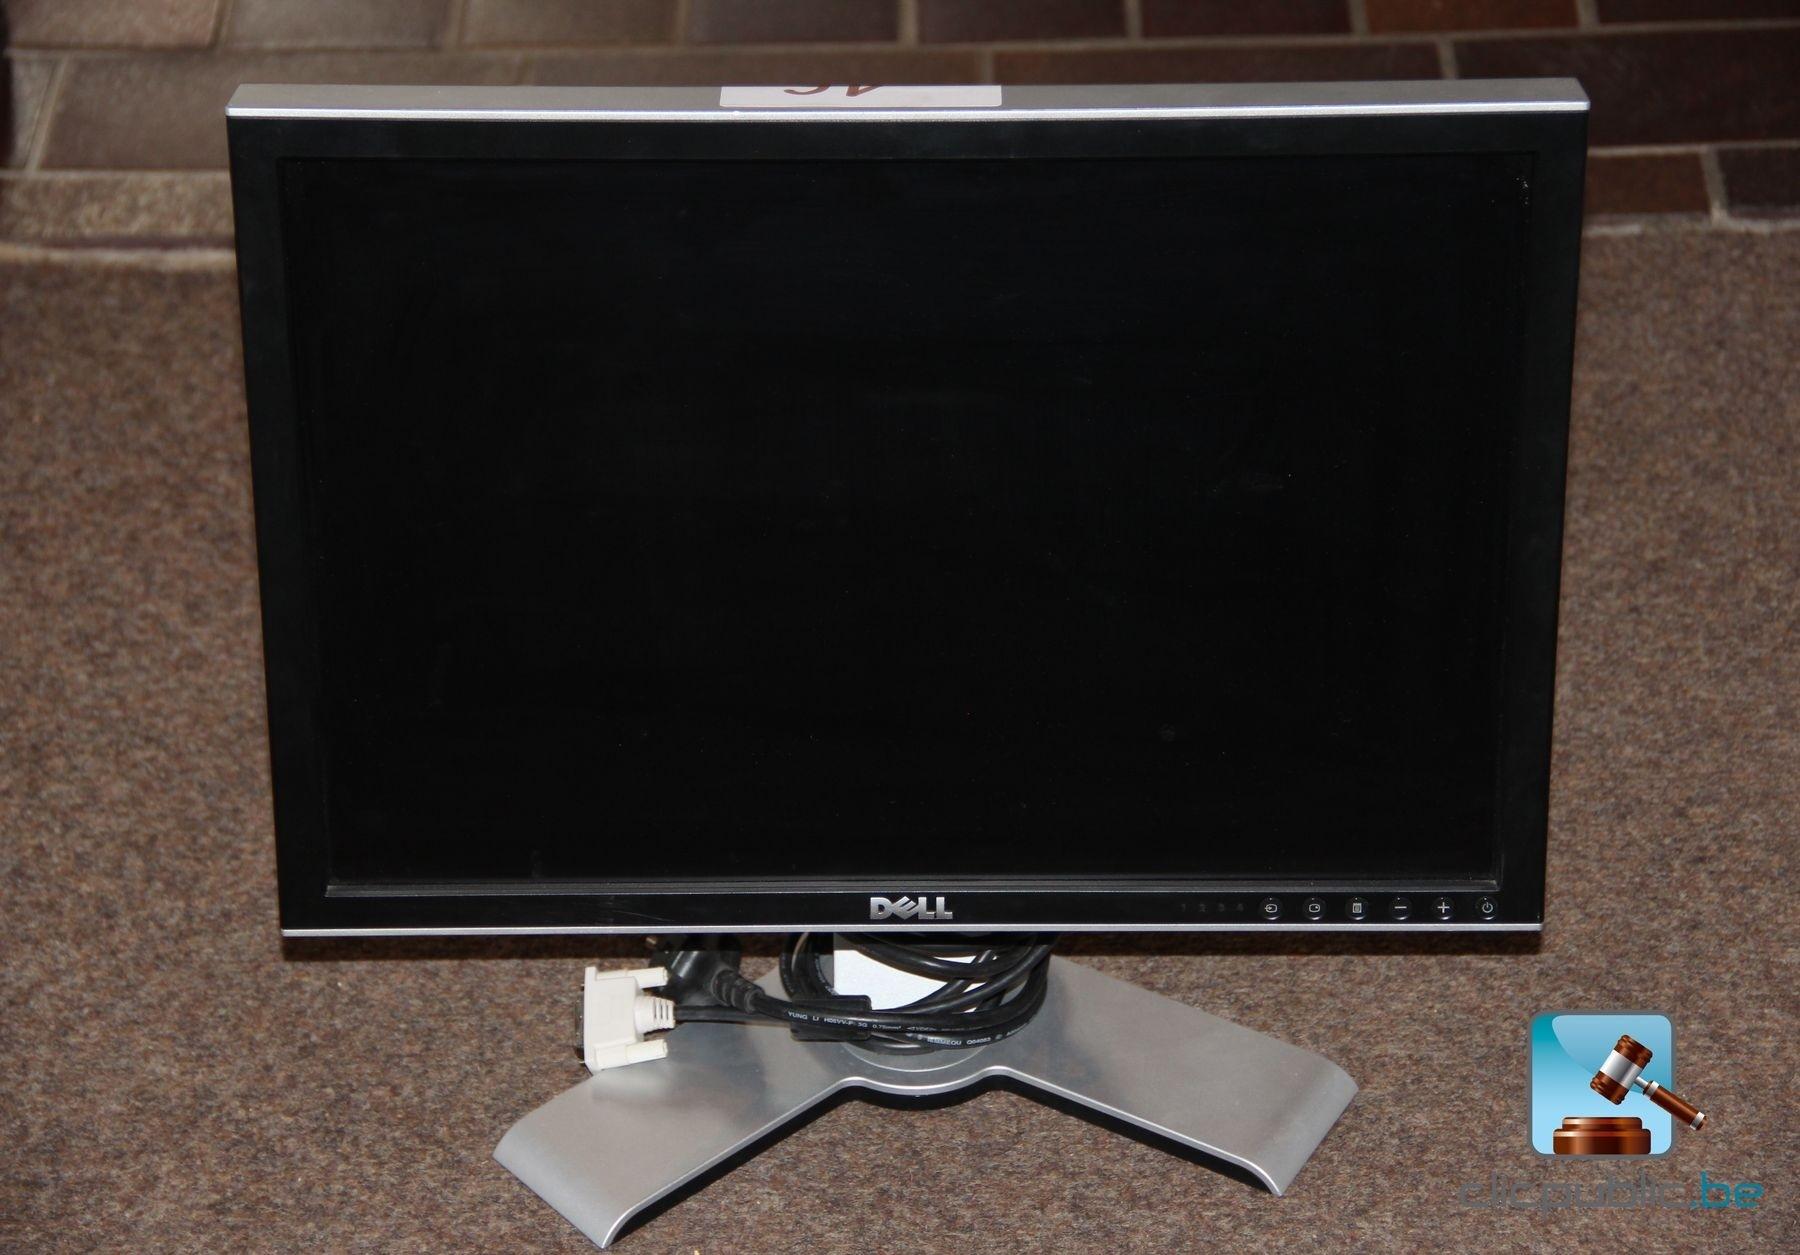 ordinateur de bureau dell optiplex 755 vendre sur. Black Bedroom Furniture Sets. Home Design Ideas